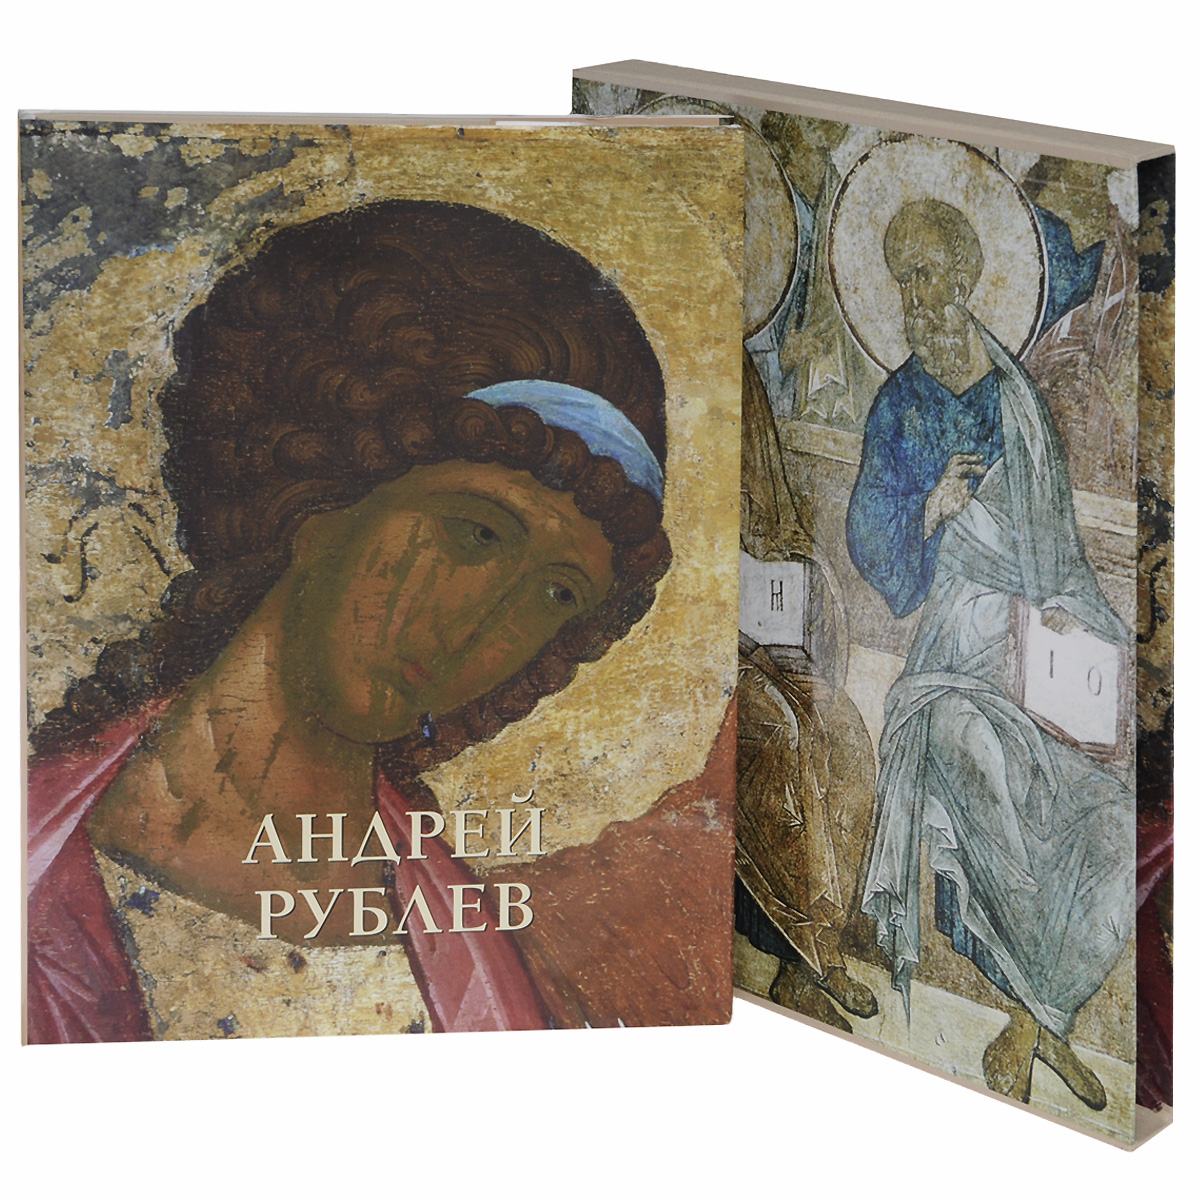 Виктор Калашников Андрей Рублев ISBN: 978-5-7793-3078-7